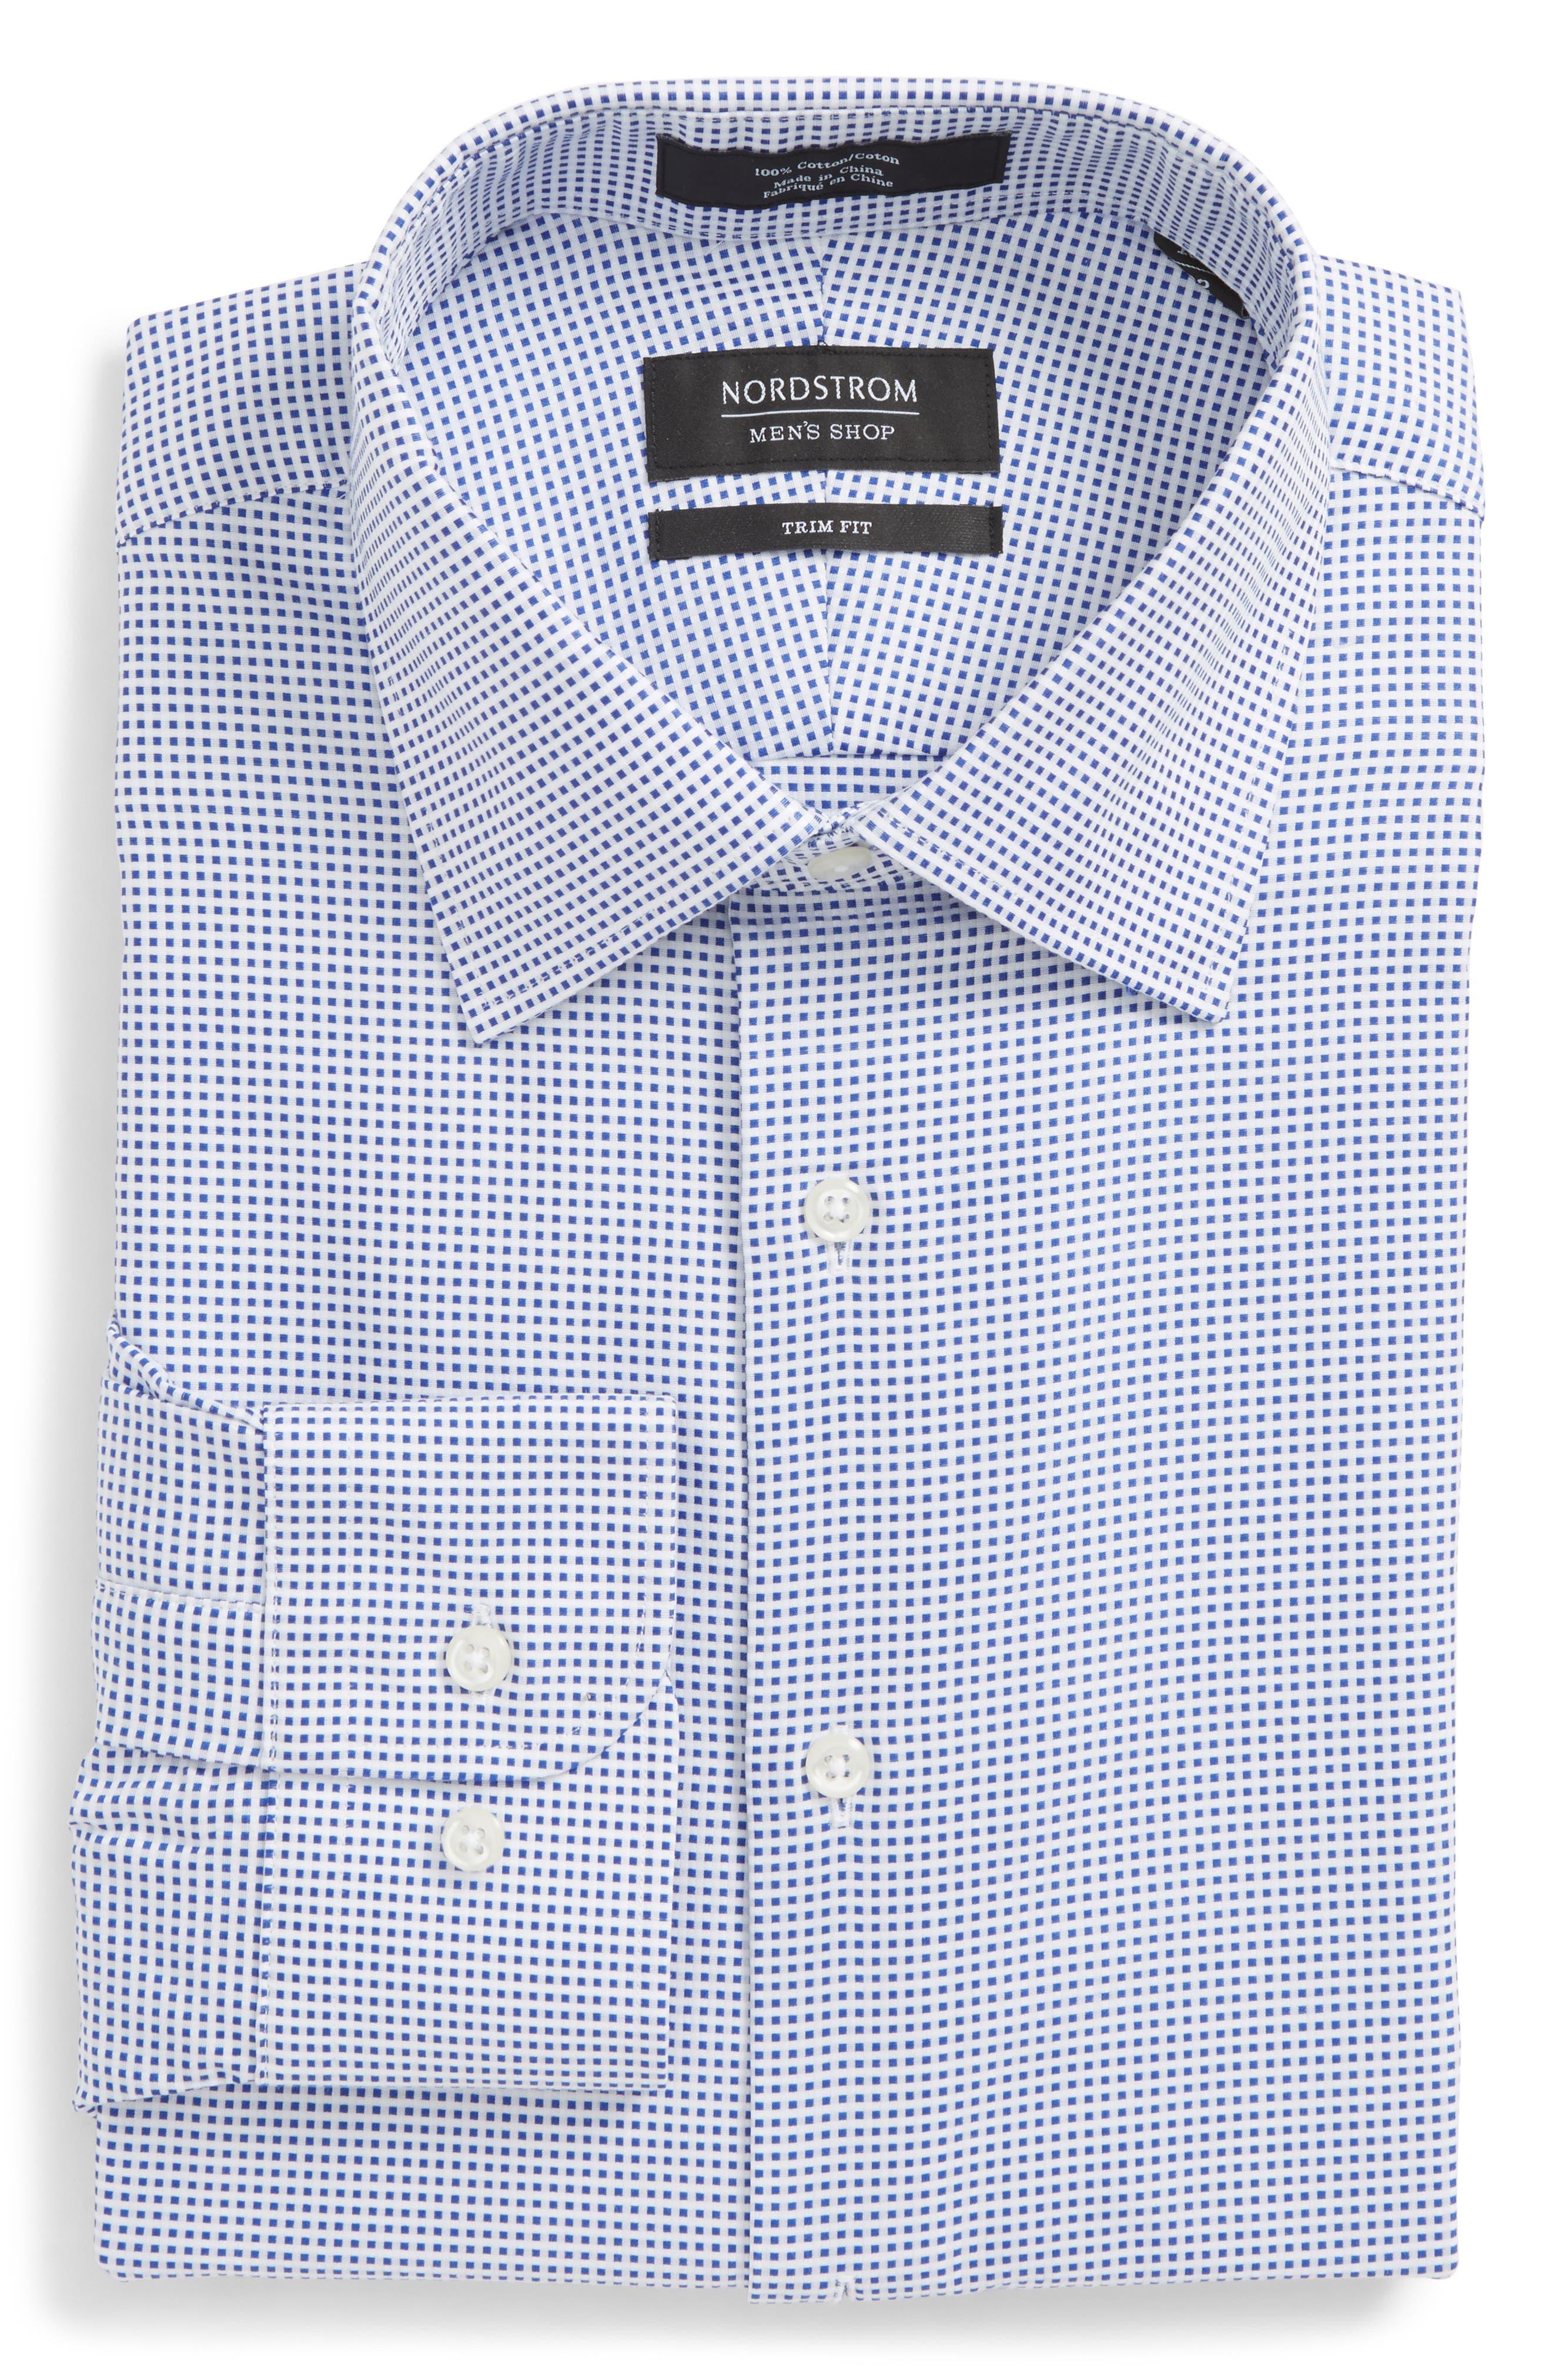 Nordstrom Men's Shop Trim Fit Microcheck Dress Shirt